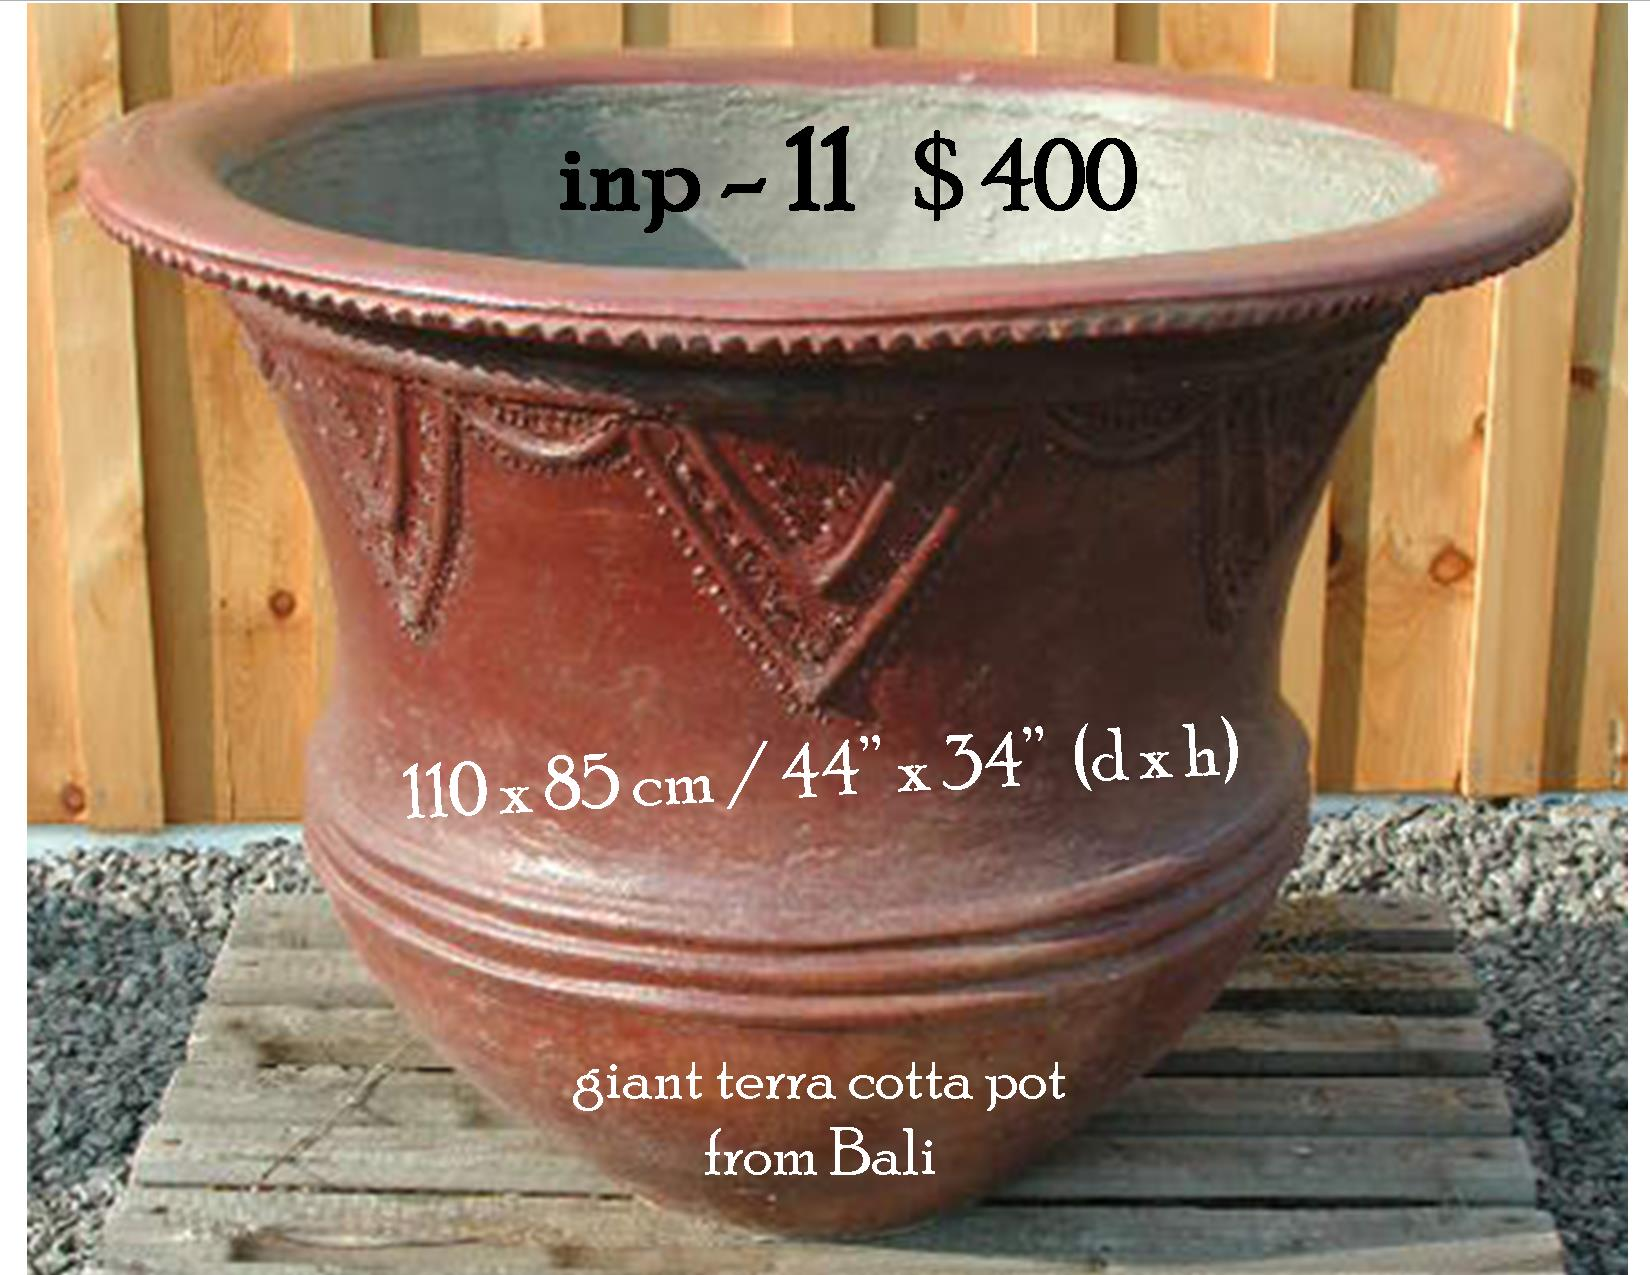 inp-11 giant terra cotta pot from Bali